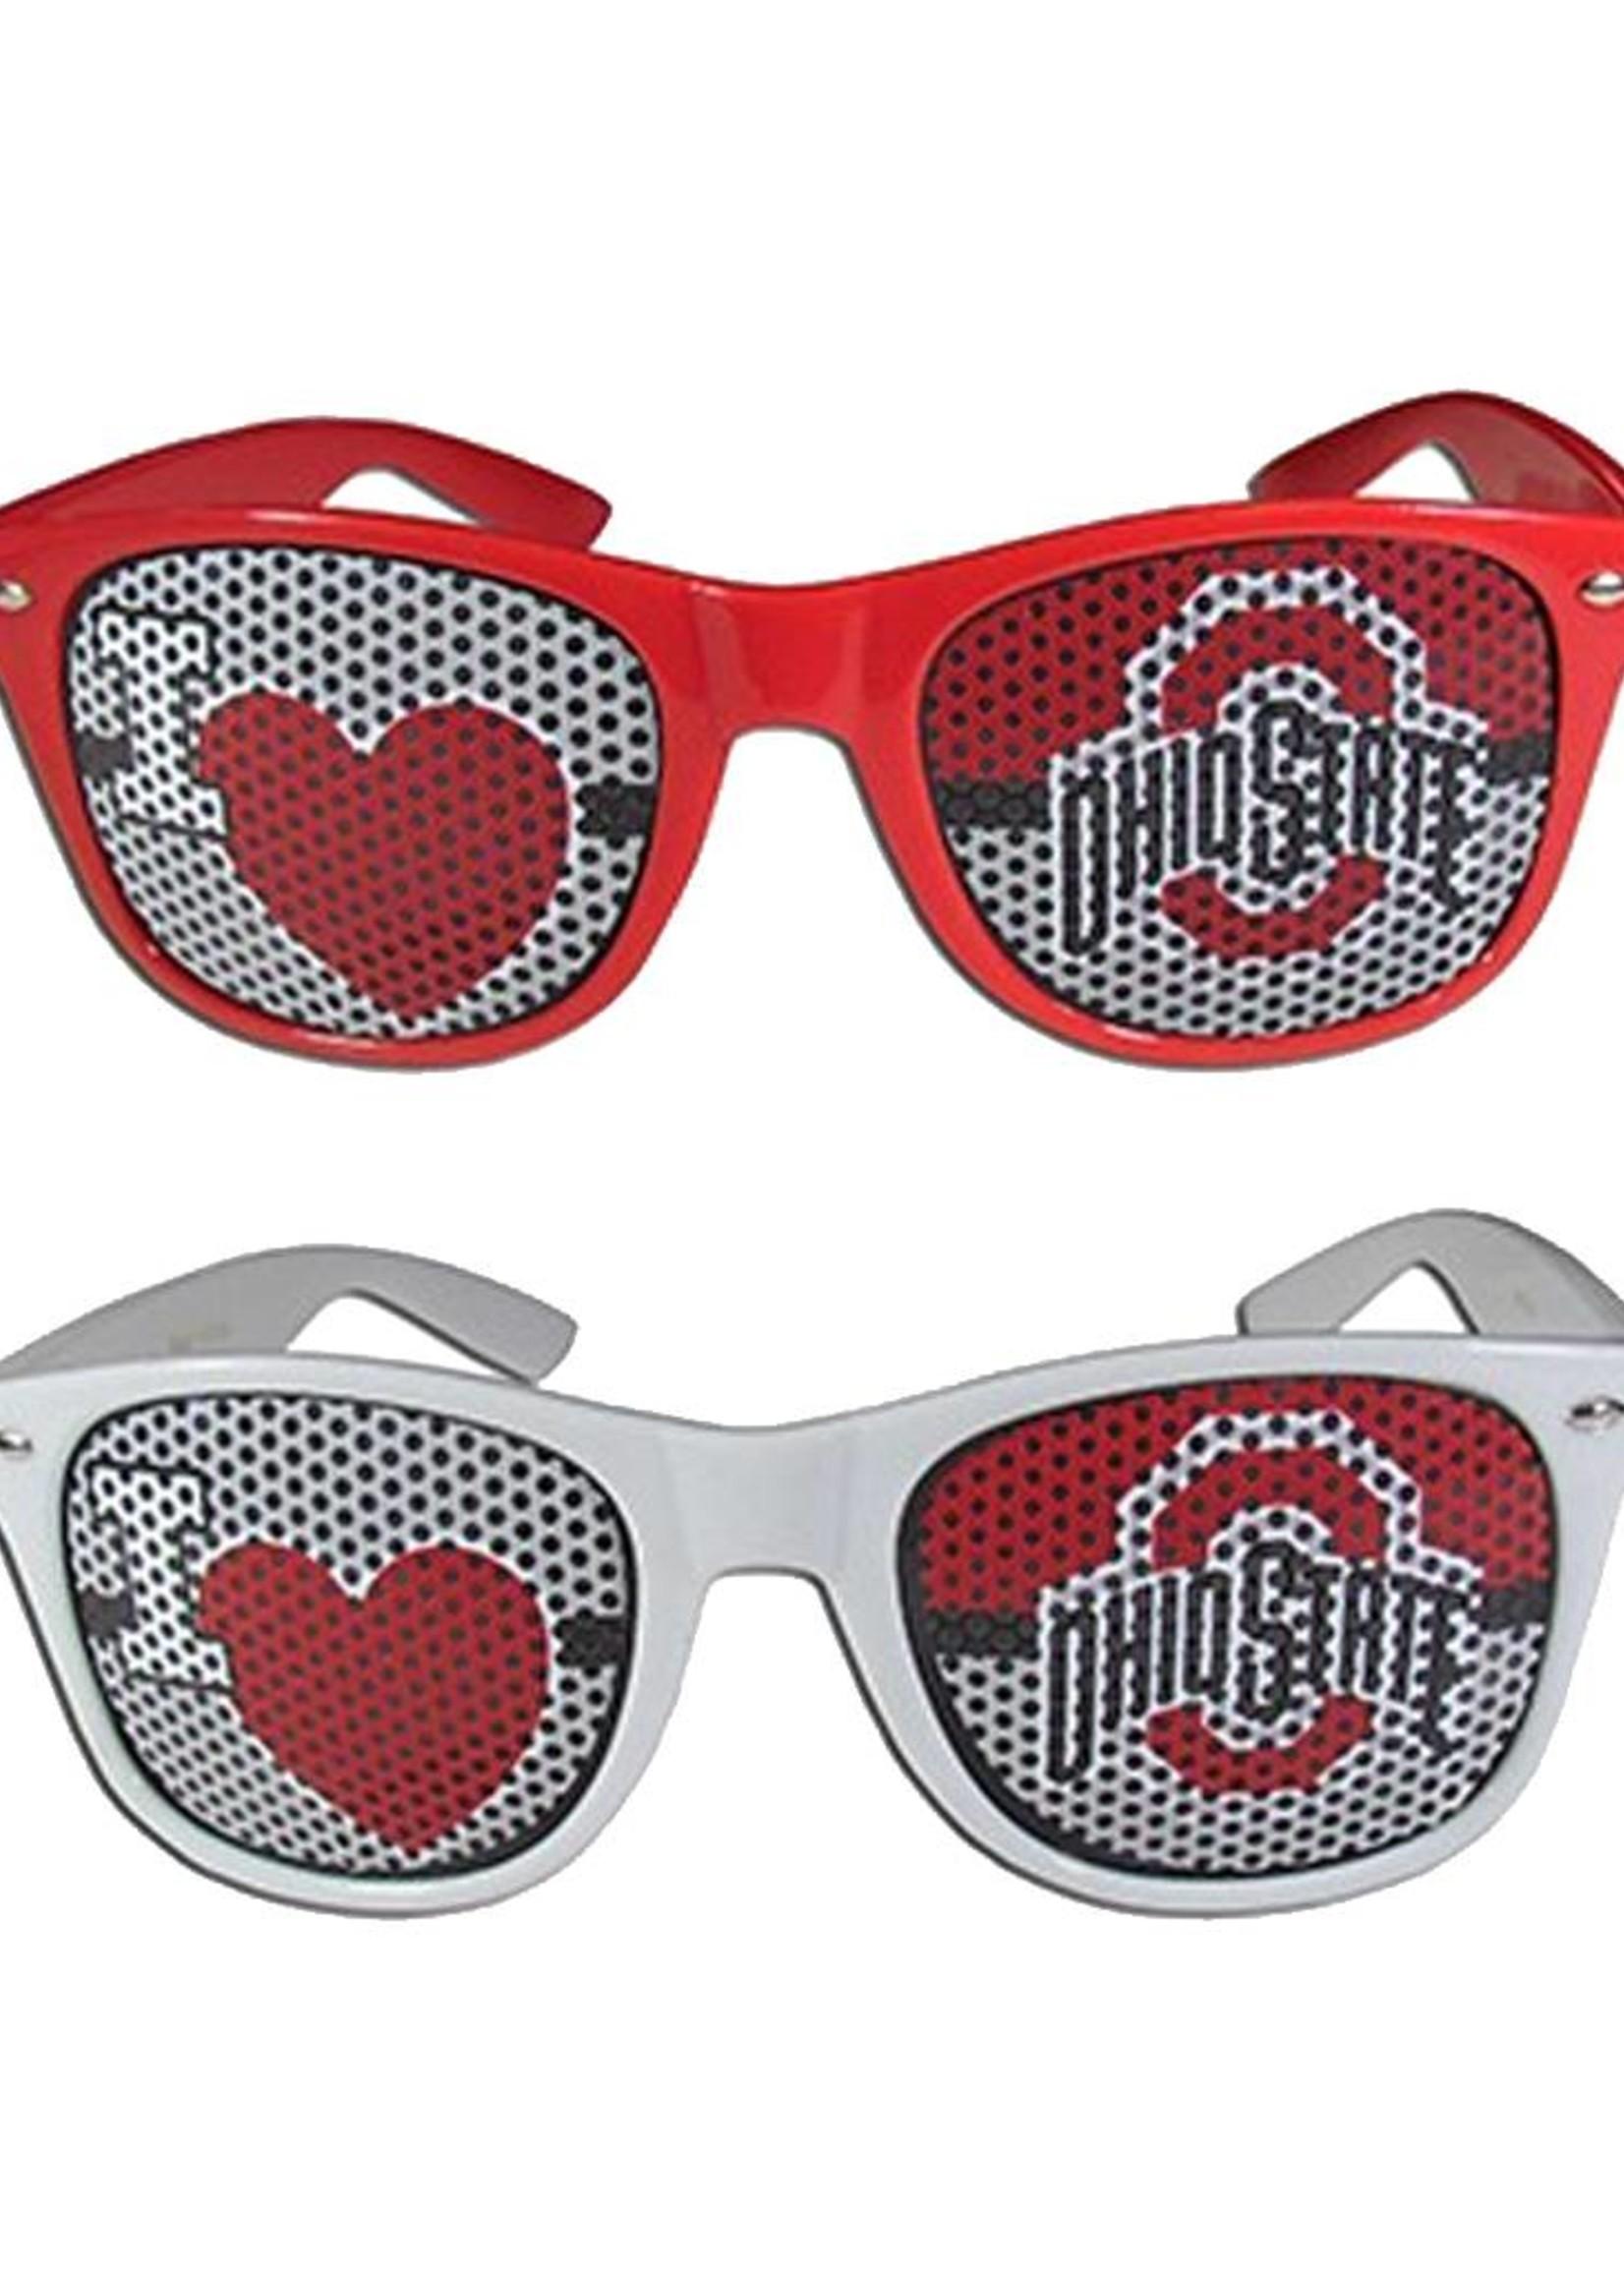 Ohio State University I Heart OSU Sunglasses